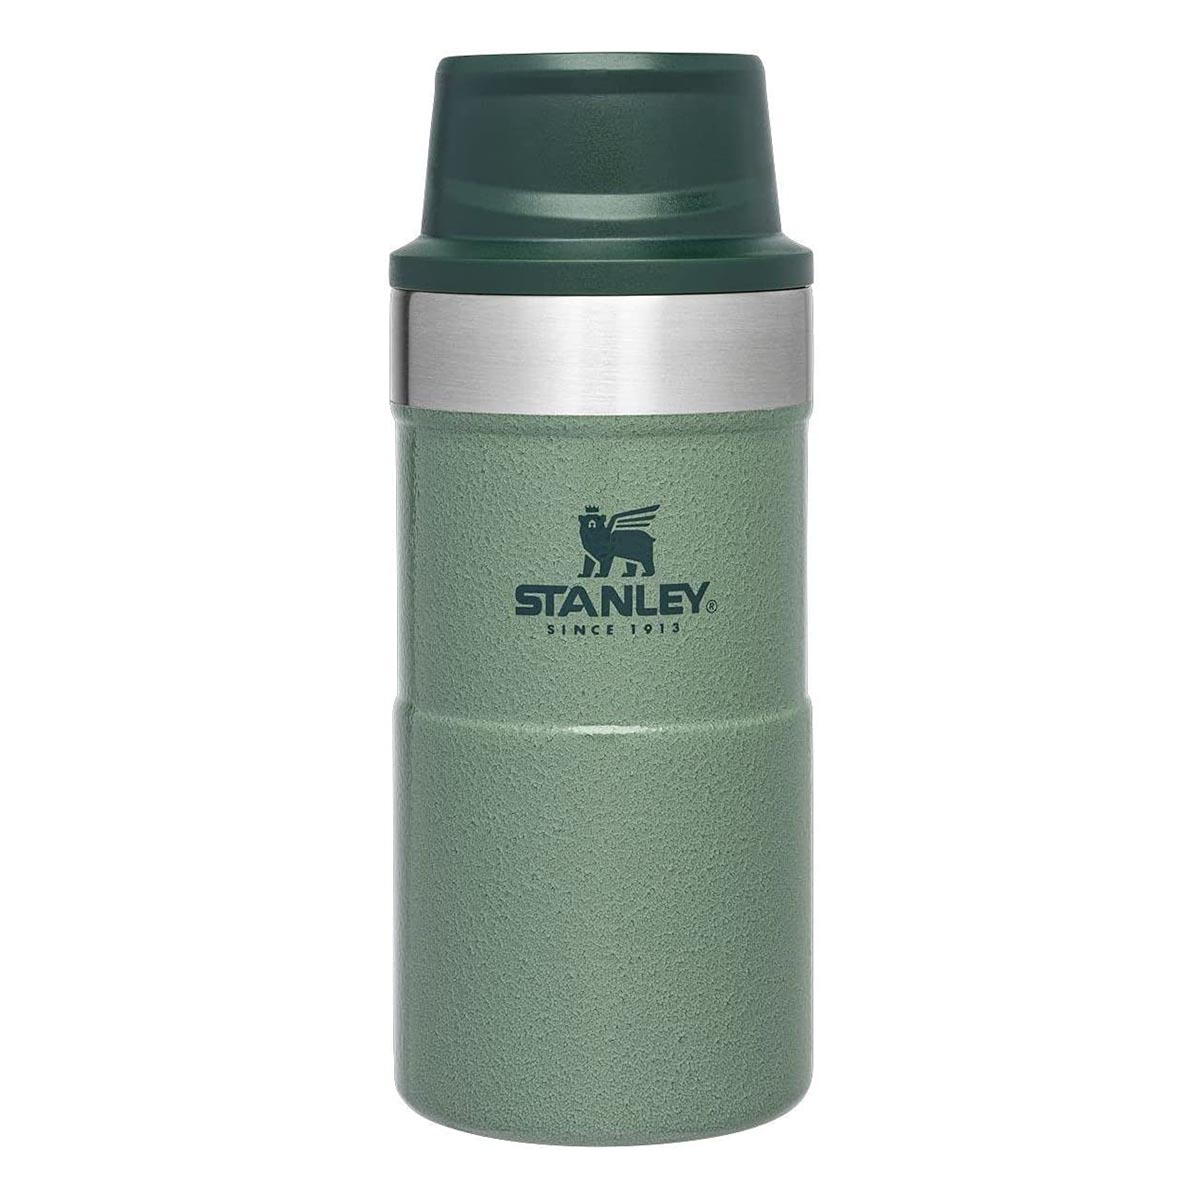 Stanley The Trigger Action Travel Mug 25L  8.5OZ  Yeşil Termos AS1009849009